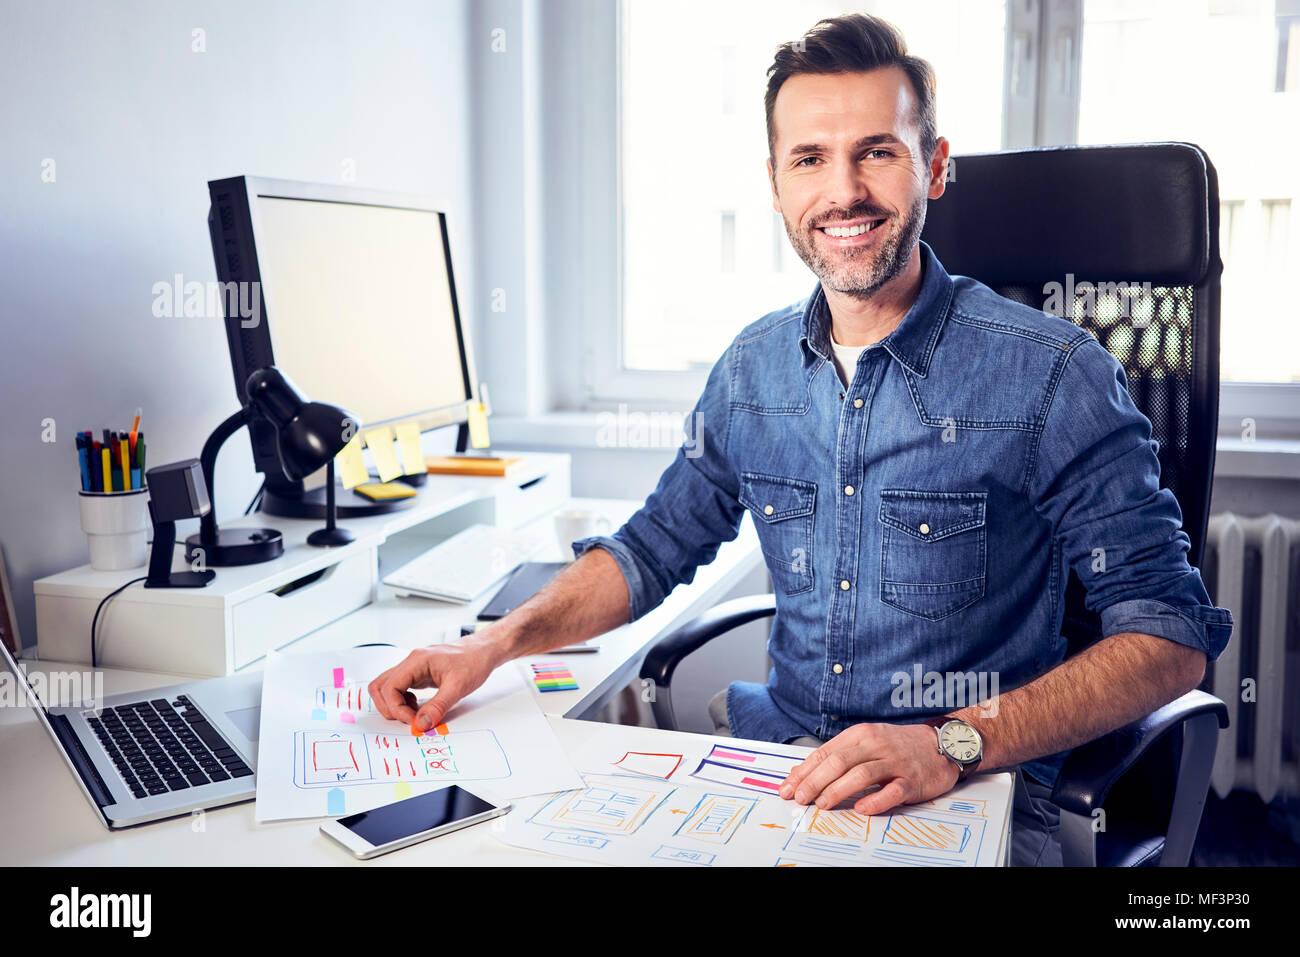 Portrait of smiling web designer travaillant sur le projet at desk in office Photo Stock